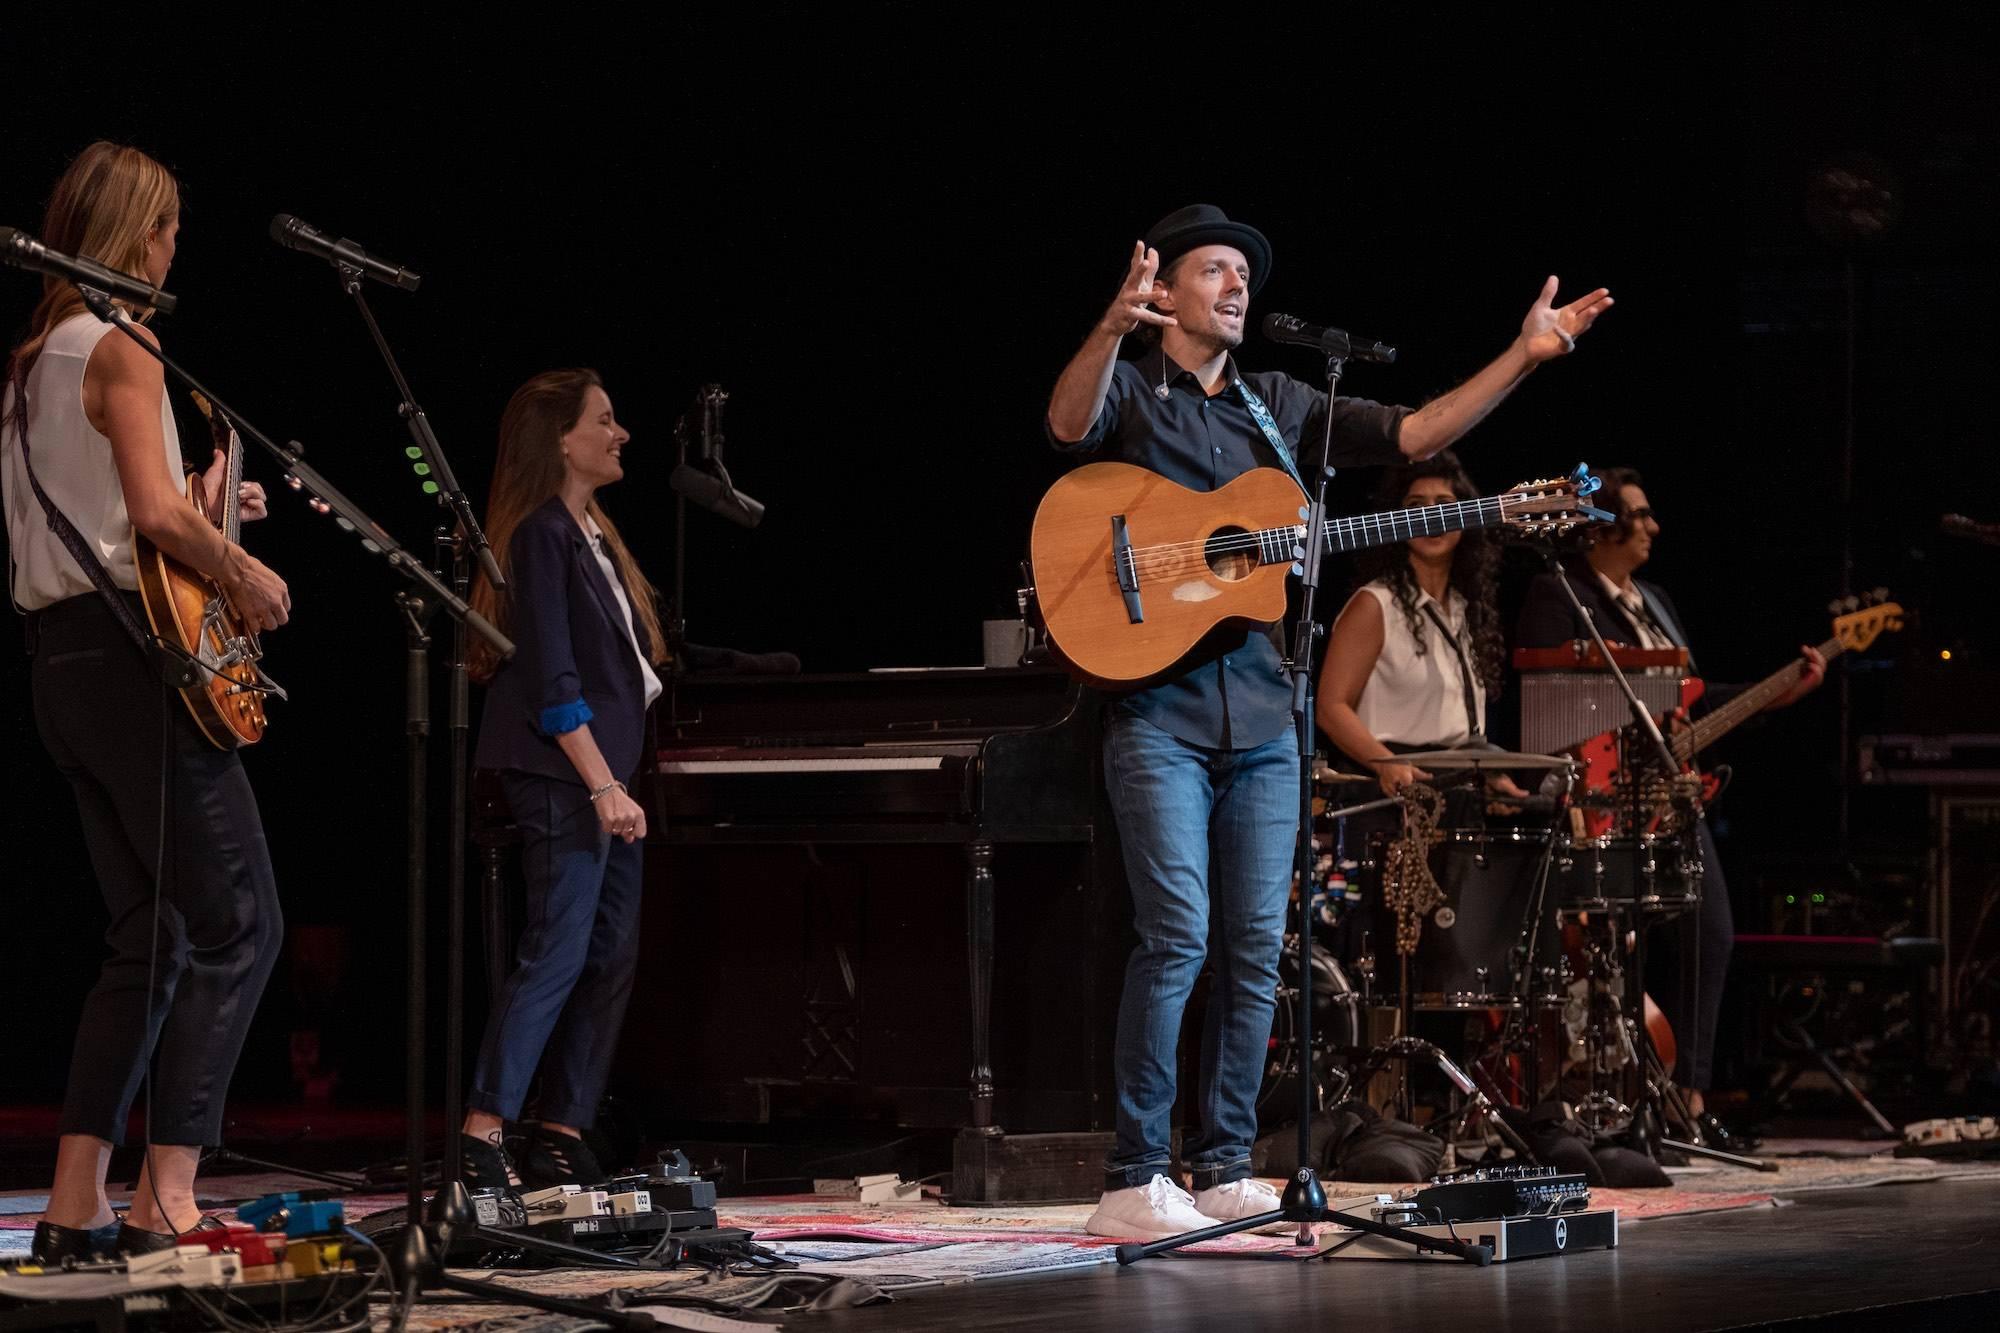 An Evening with Jason Mraz & Raining Jane at the Queen Elizabeth Theatre, Vancouver, Nov 8 2019. Scott Alexander photo.